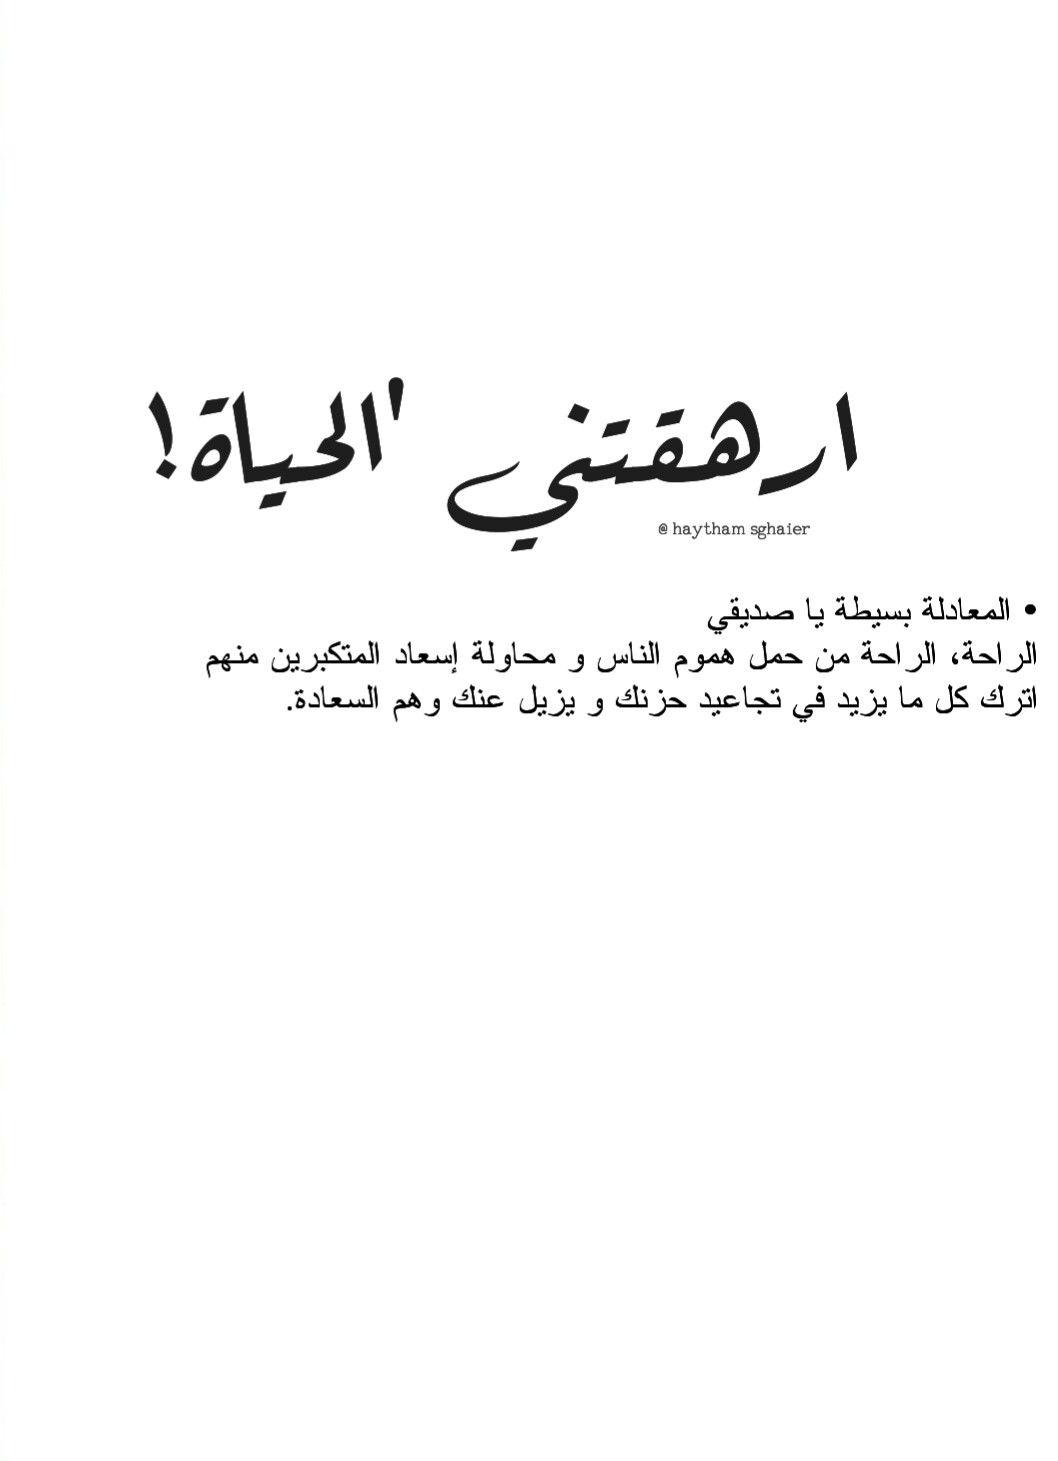 Pin By Haytham Sghaier On تأمل تصاميم مختلفة Arabic Calligraphy Calligraphy